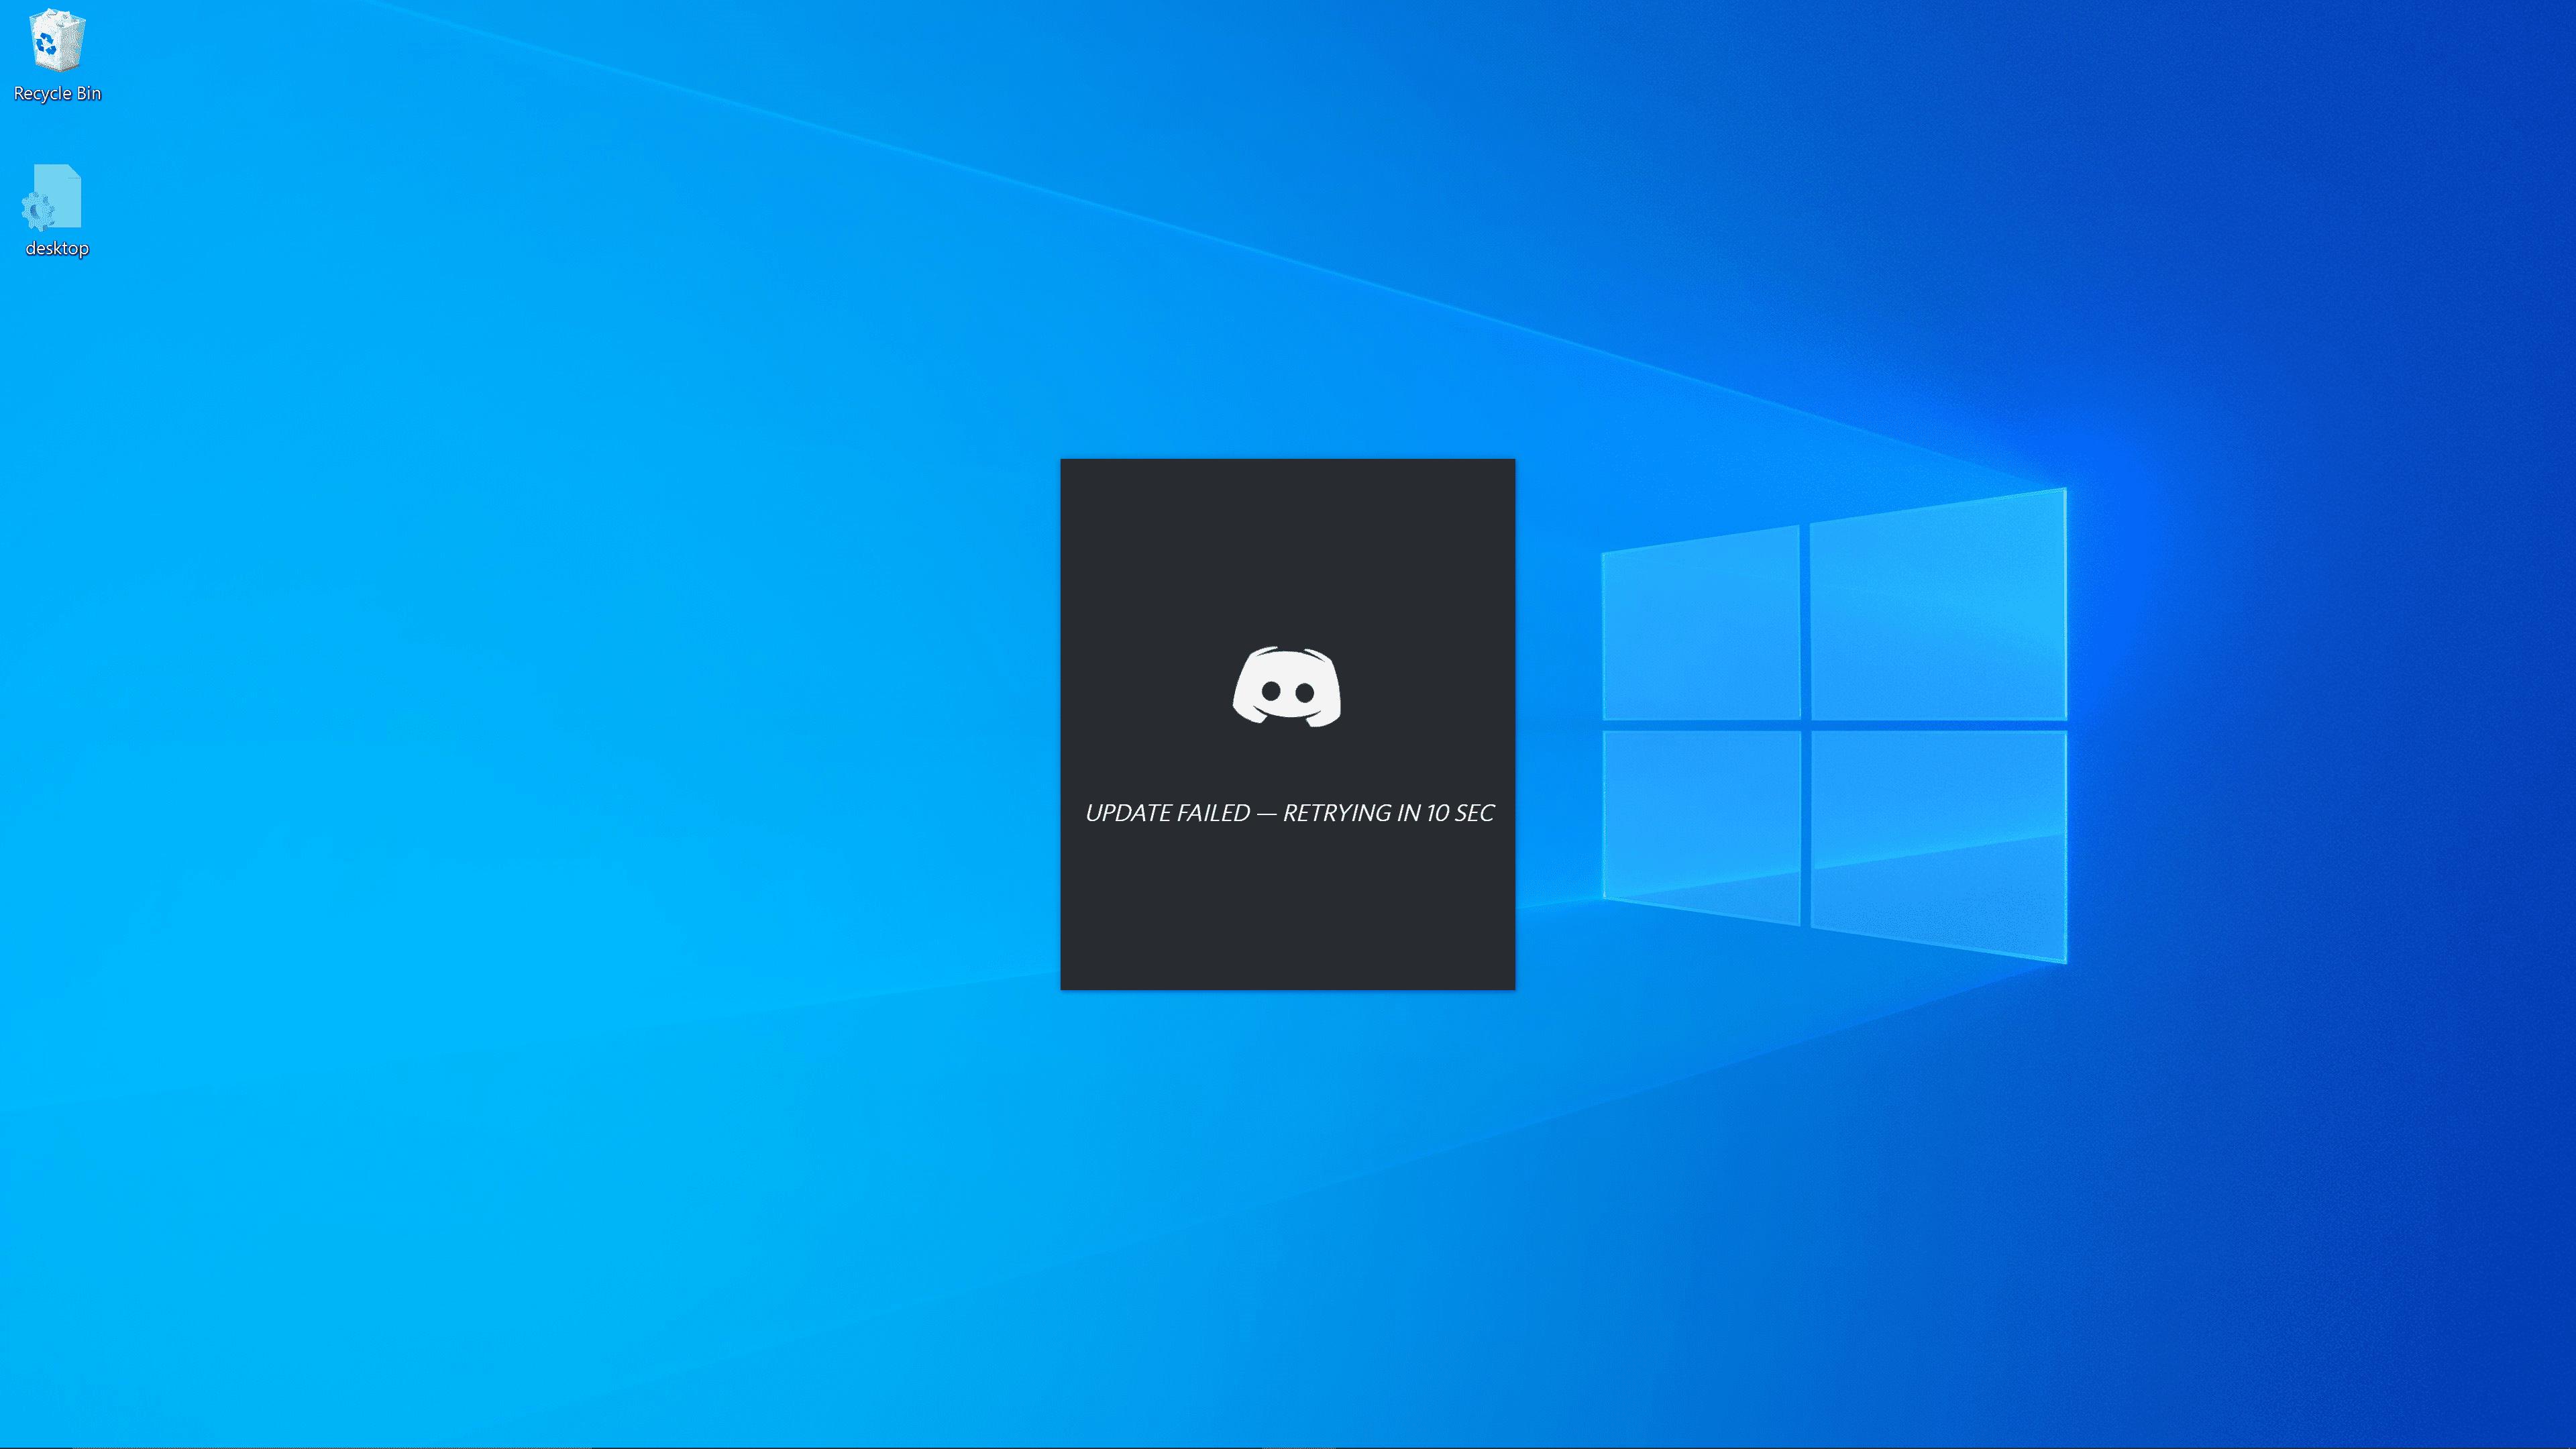 A screenshot of a failed discord update.